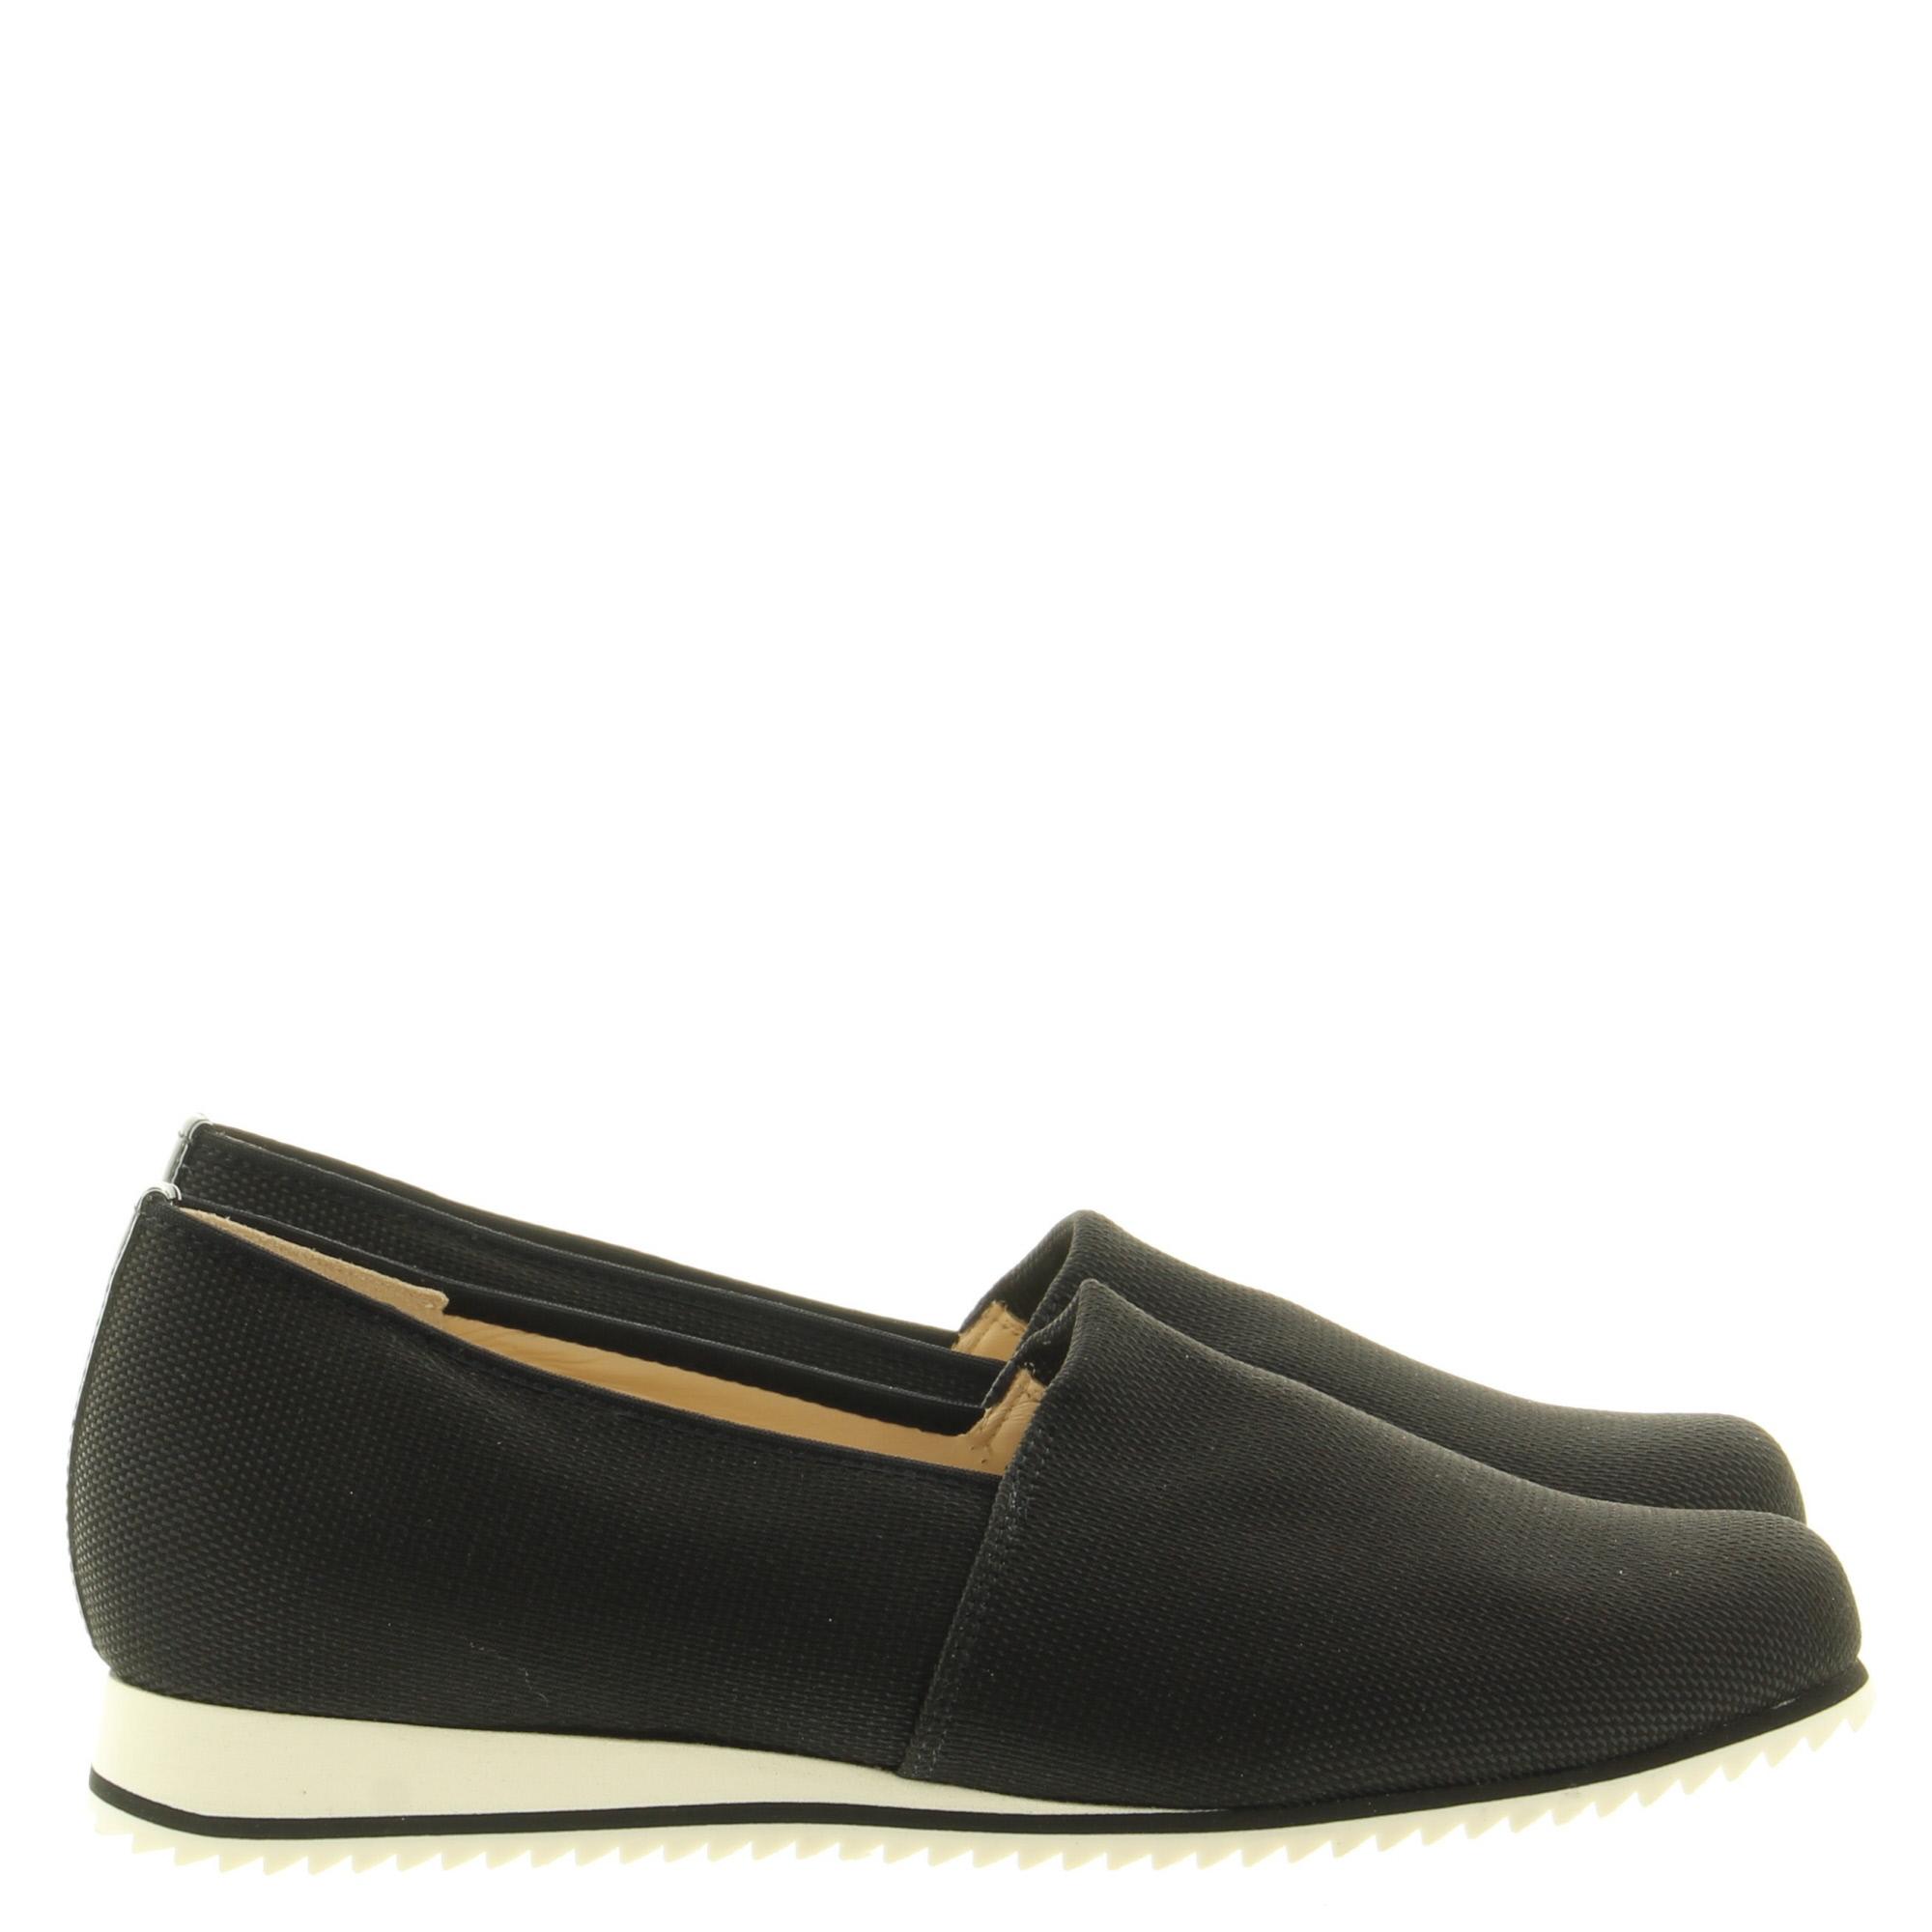 Hassia Shoes 301688 Piacenza 0100 Schwarz